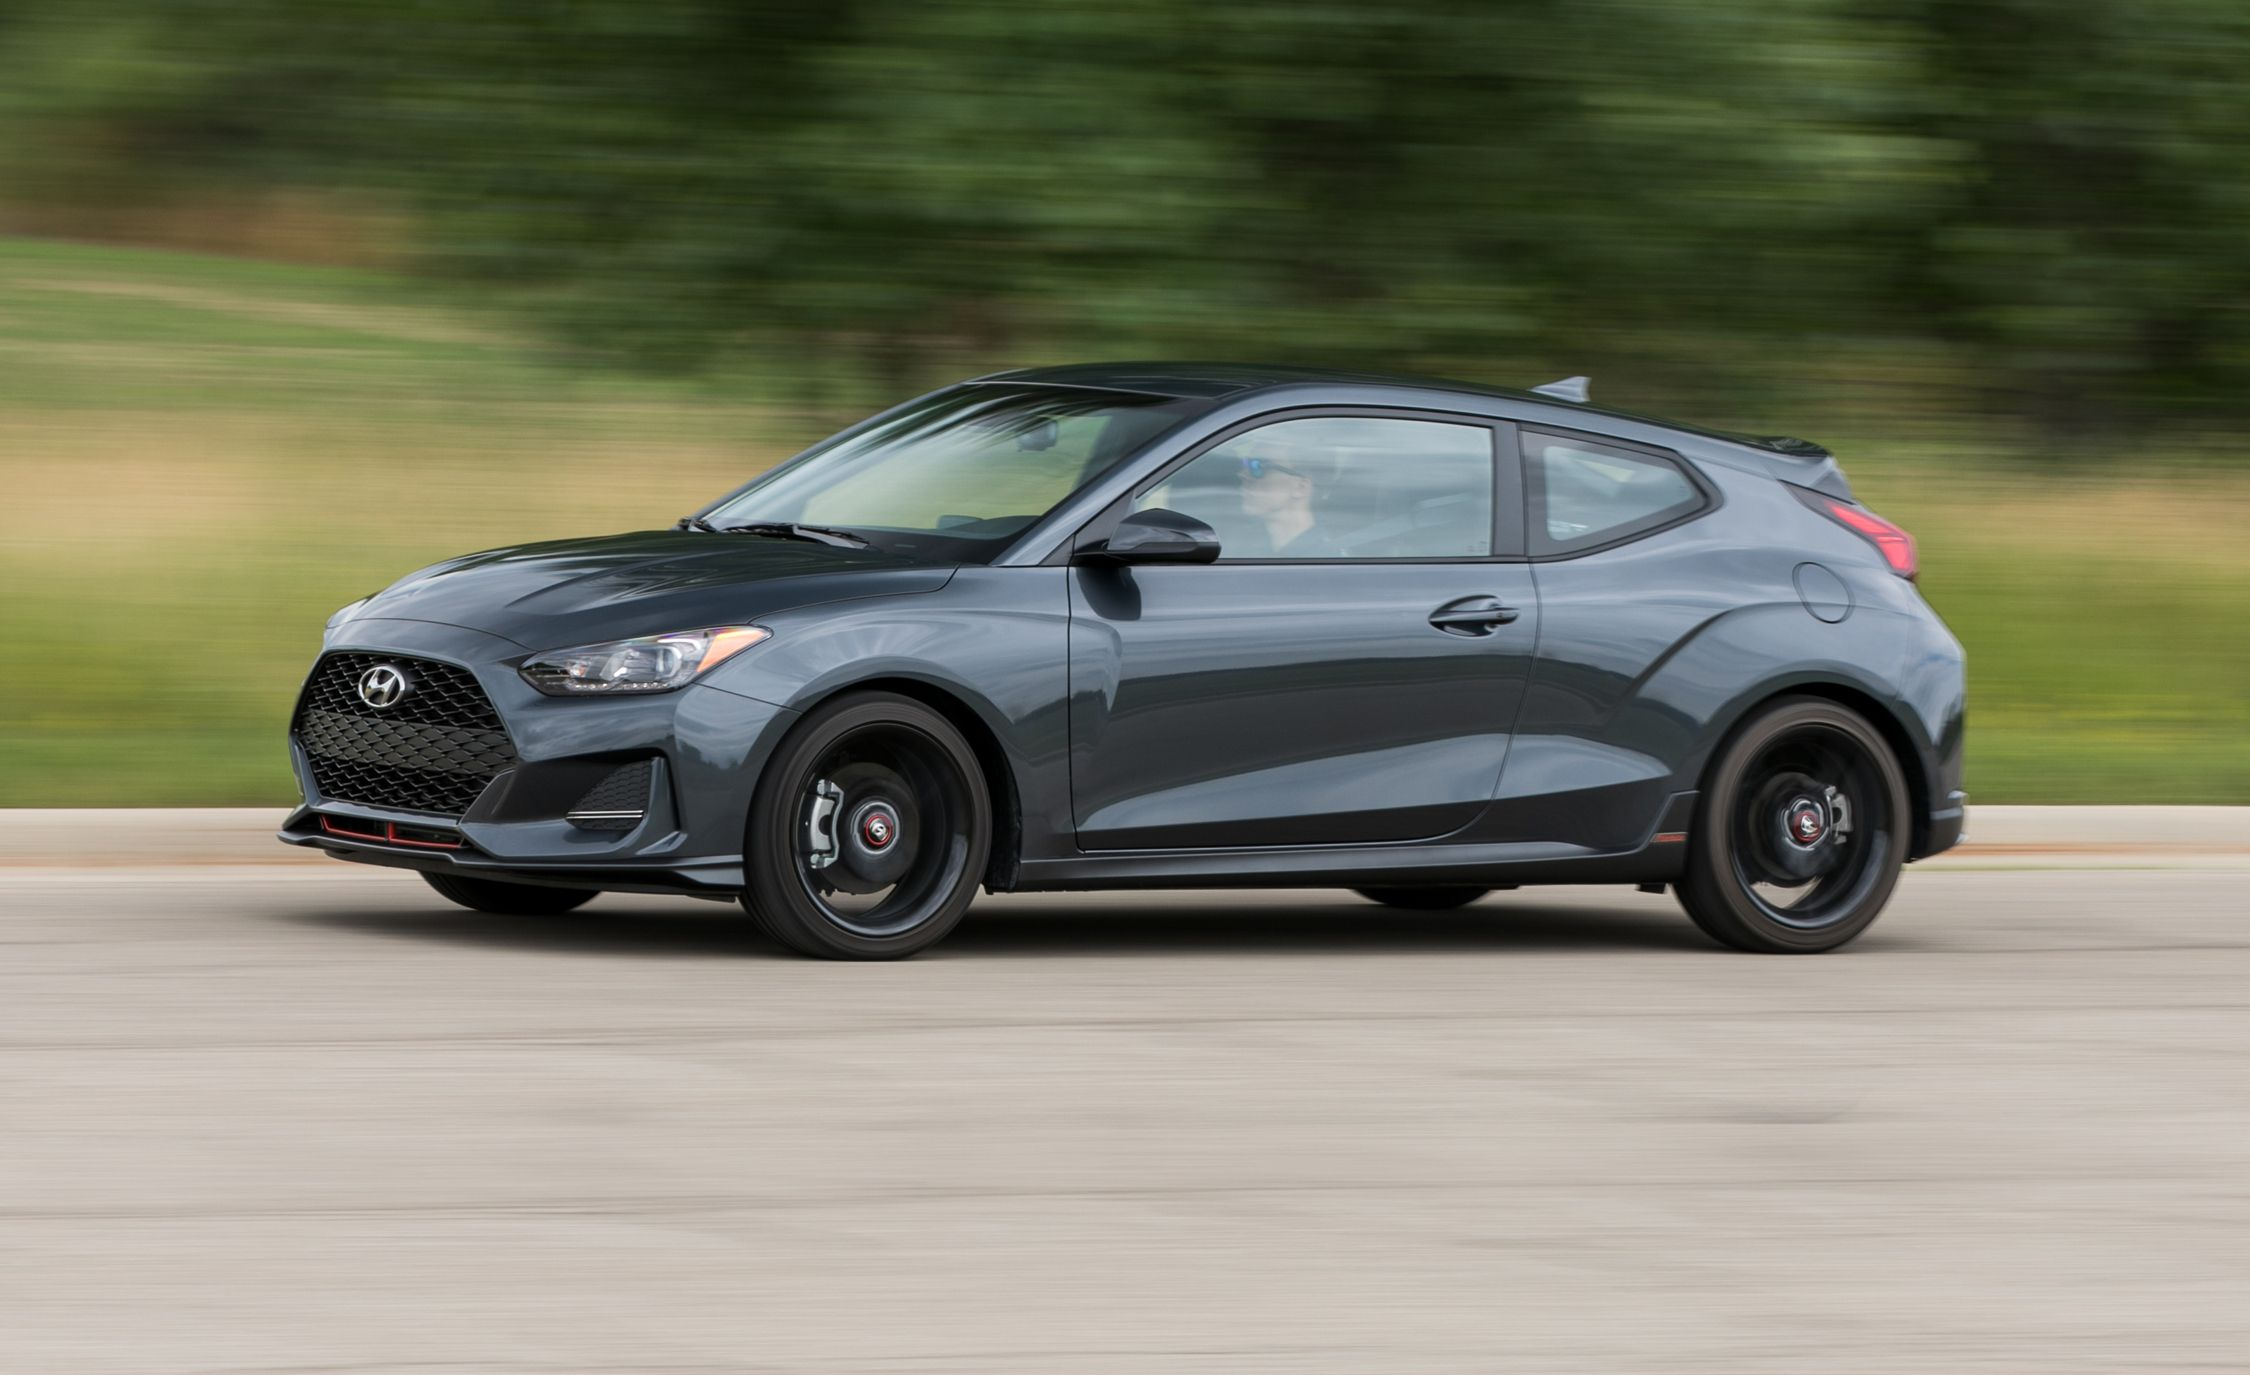 2019 Hyundai Veloster First Drive Still Funky Way Better Than